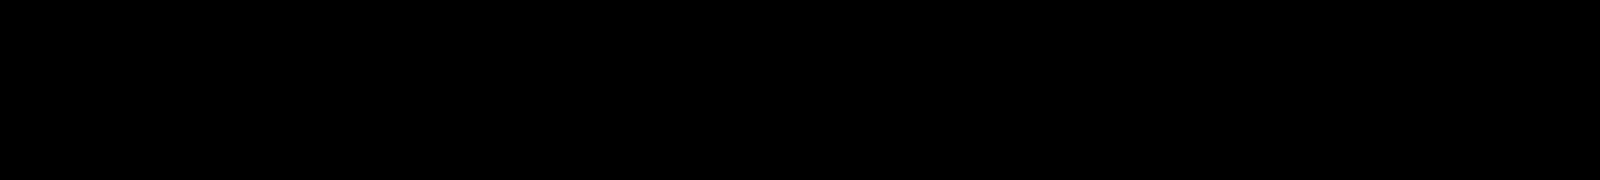 Shu Uemura Flagship Title Banner - Cleansing Oils